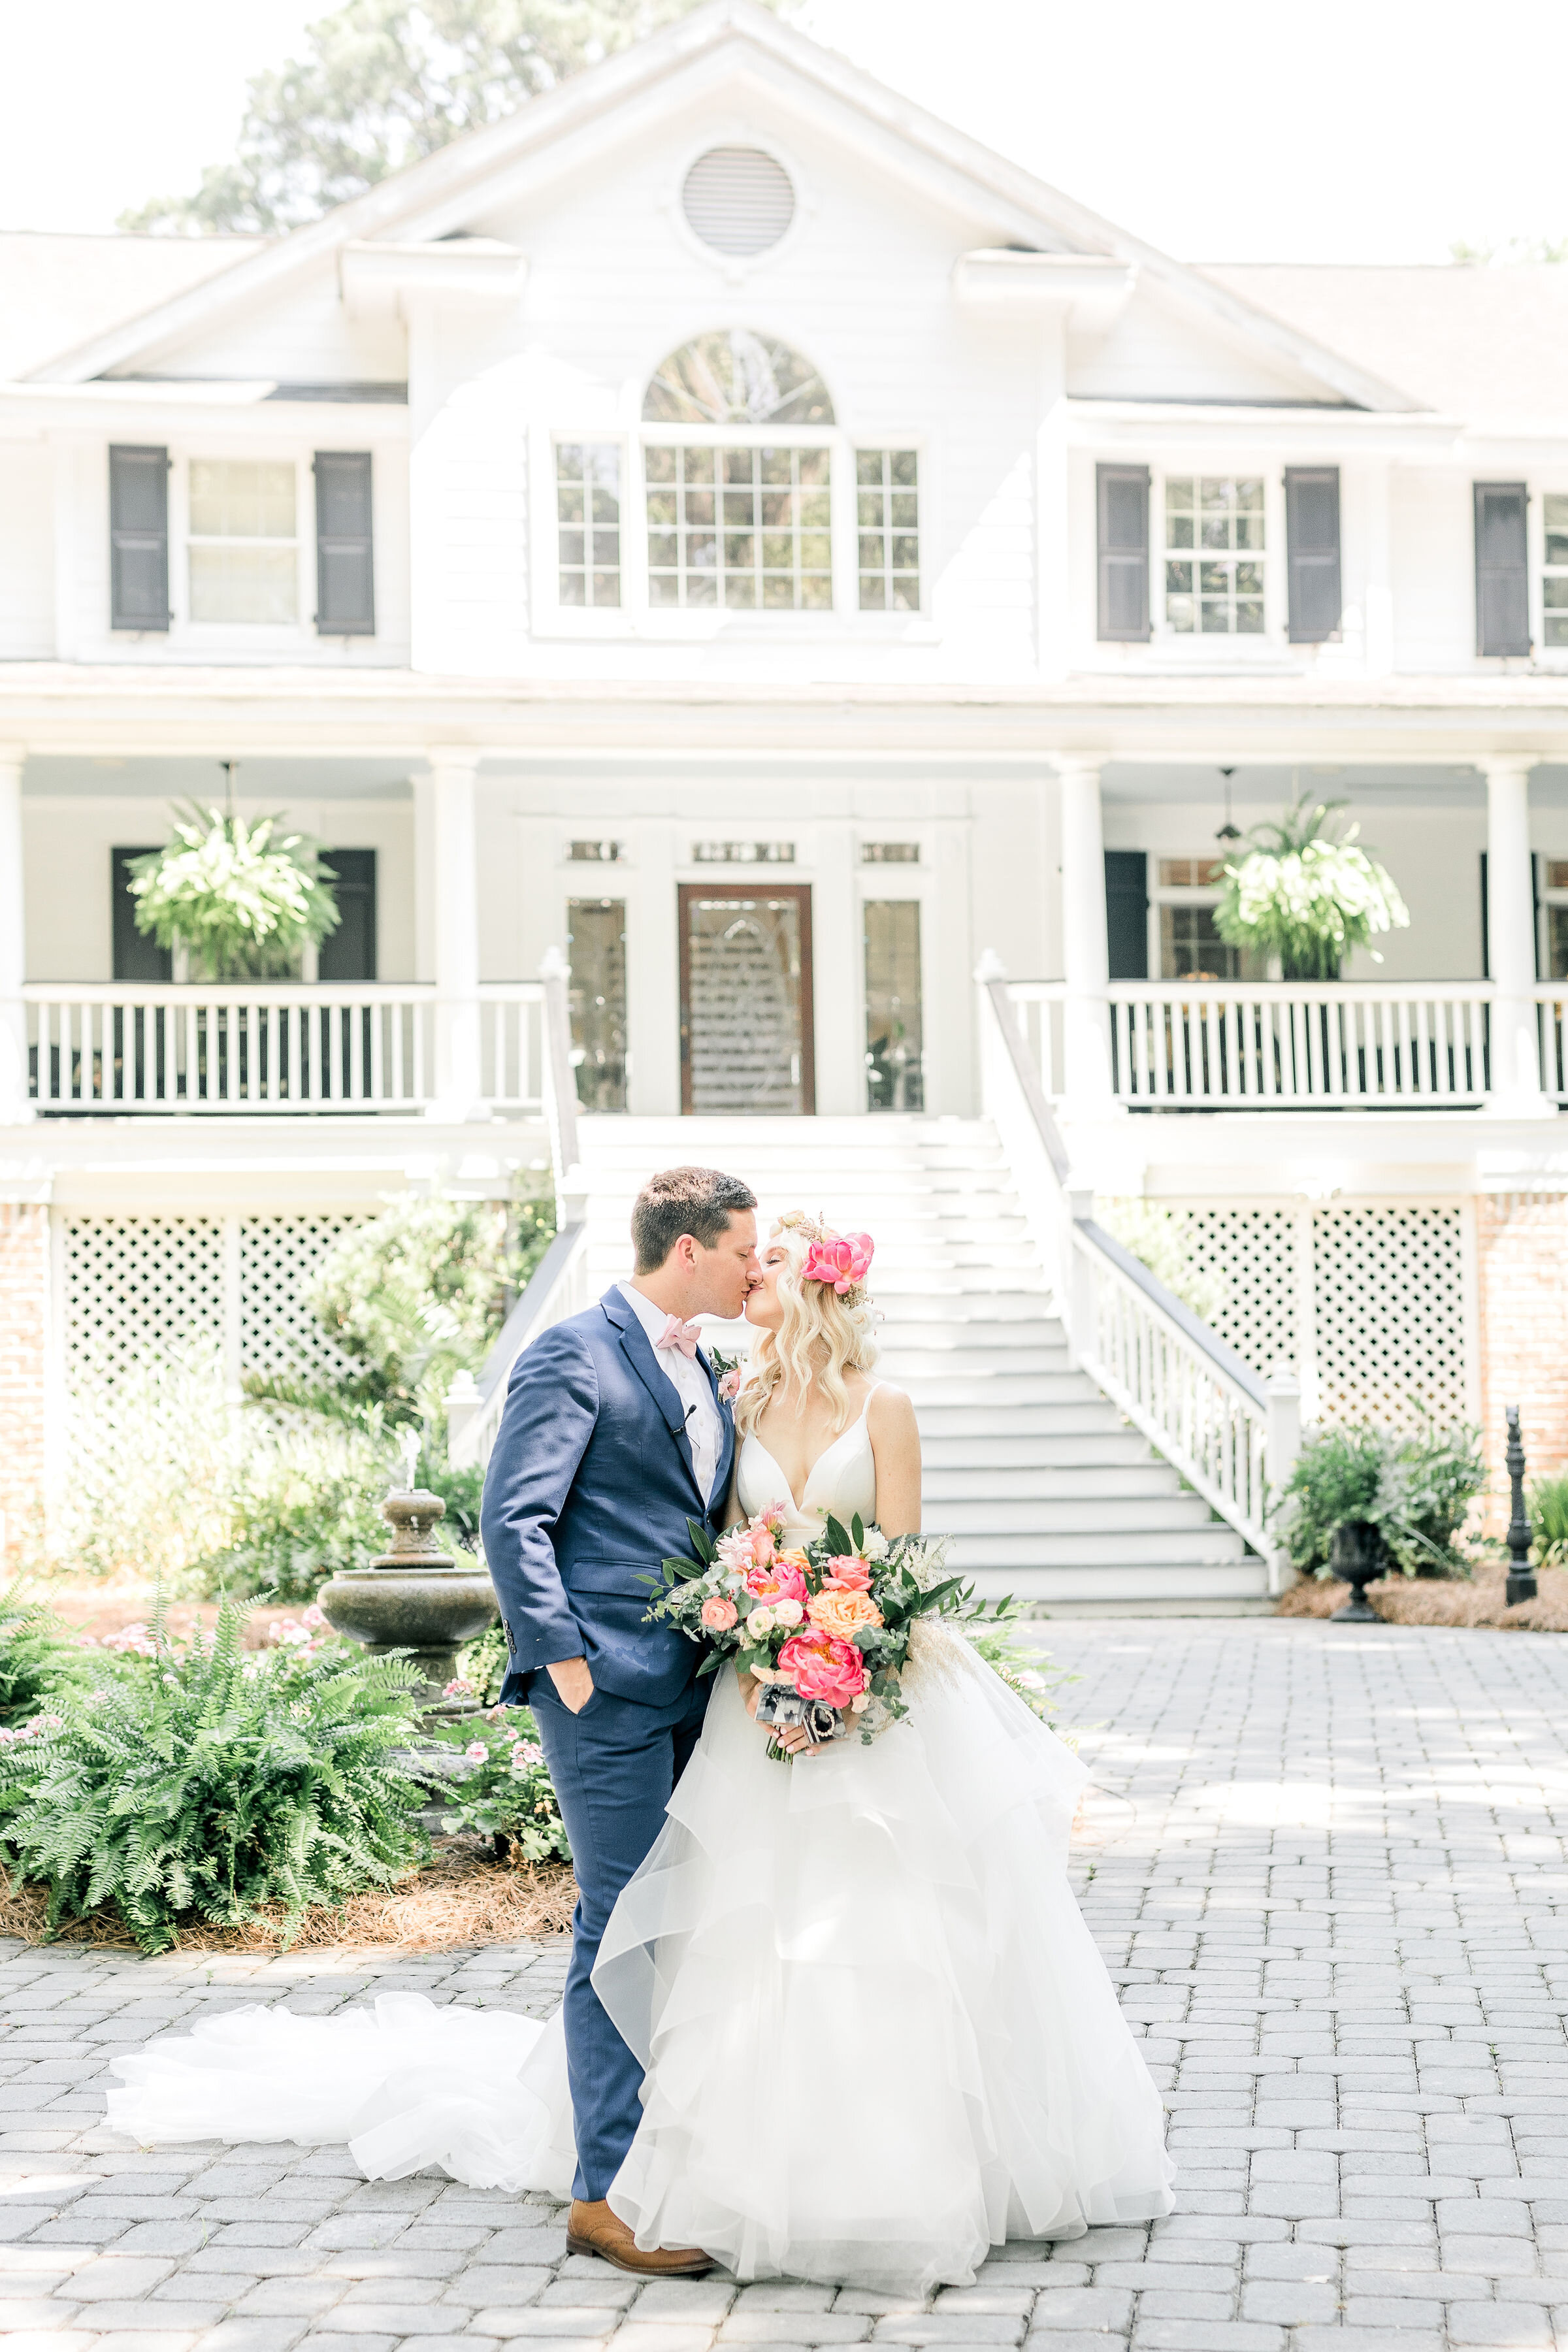 mackey-house-wedding-mackeyhouse-savannah-wedding-southern-wedding-hotpink-flowers-pink-and-ivory-flowers-ivory-and-beau-gown.jpg